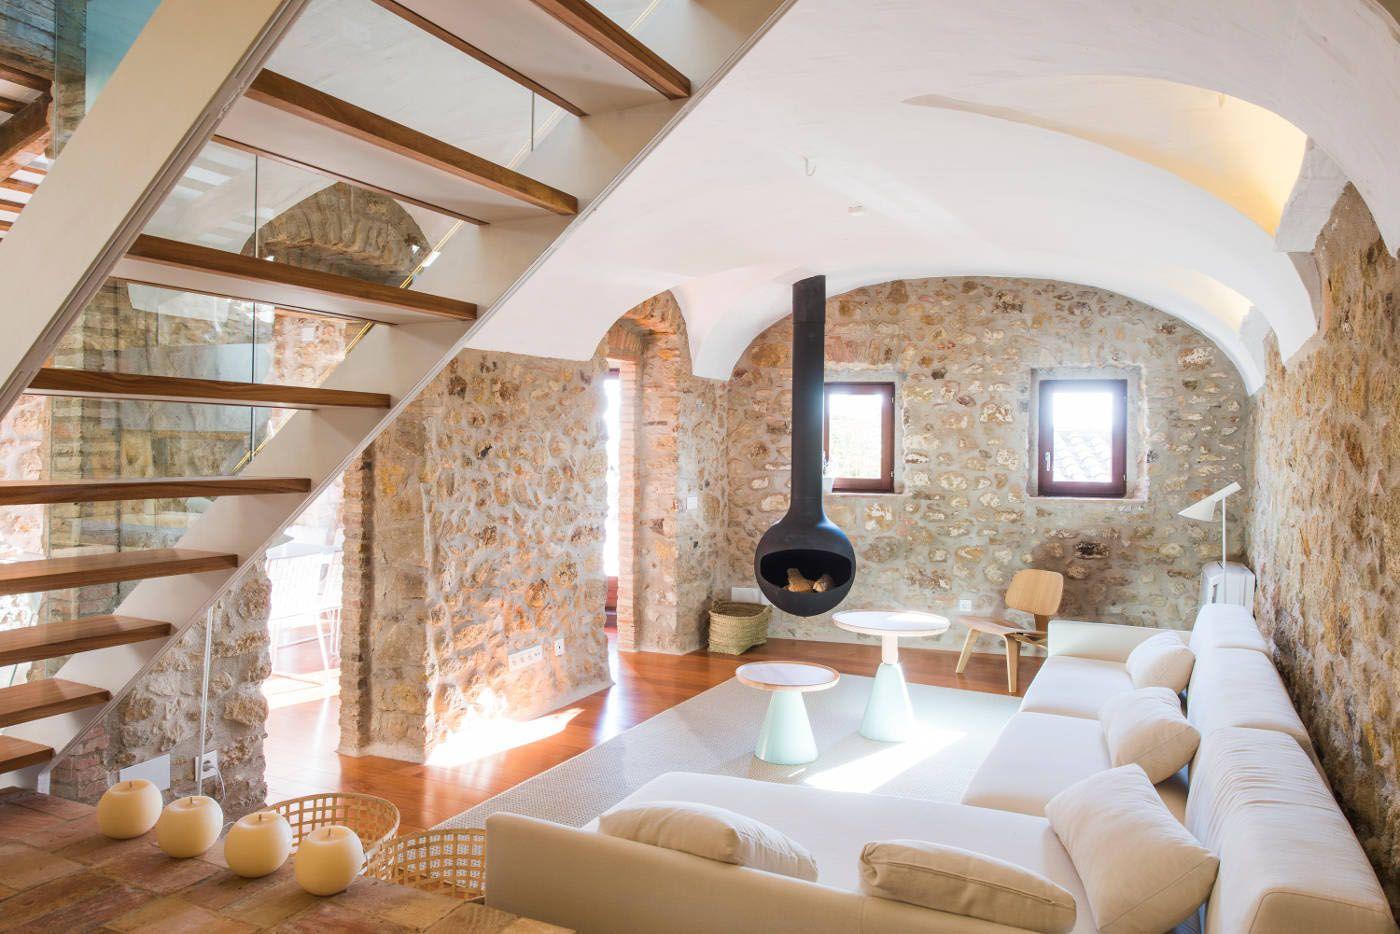 A 19th Century Stone House On The Costa Brava Transformed Into Modern Retreat